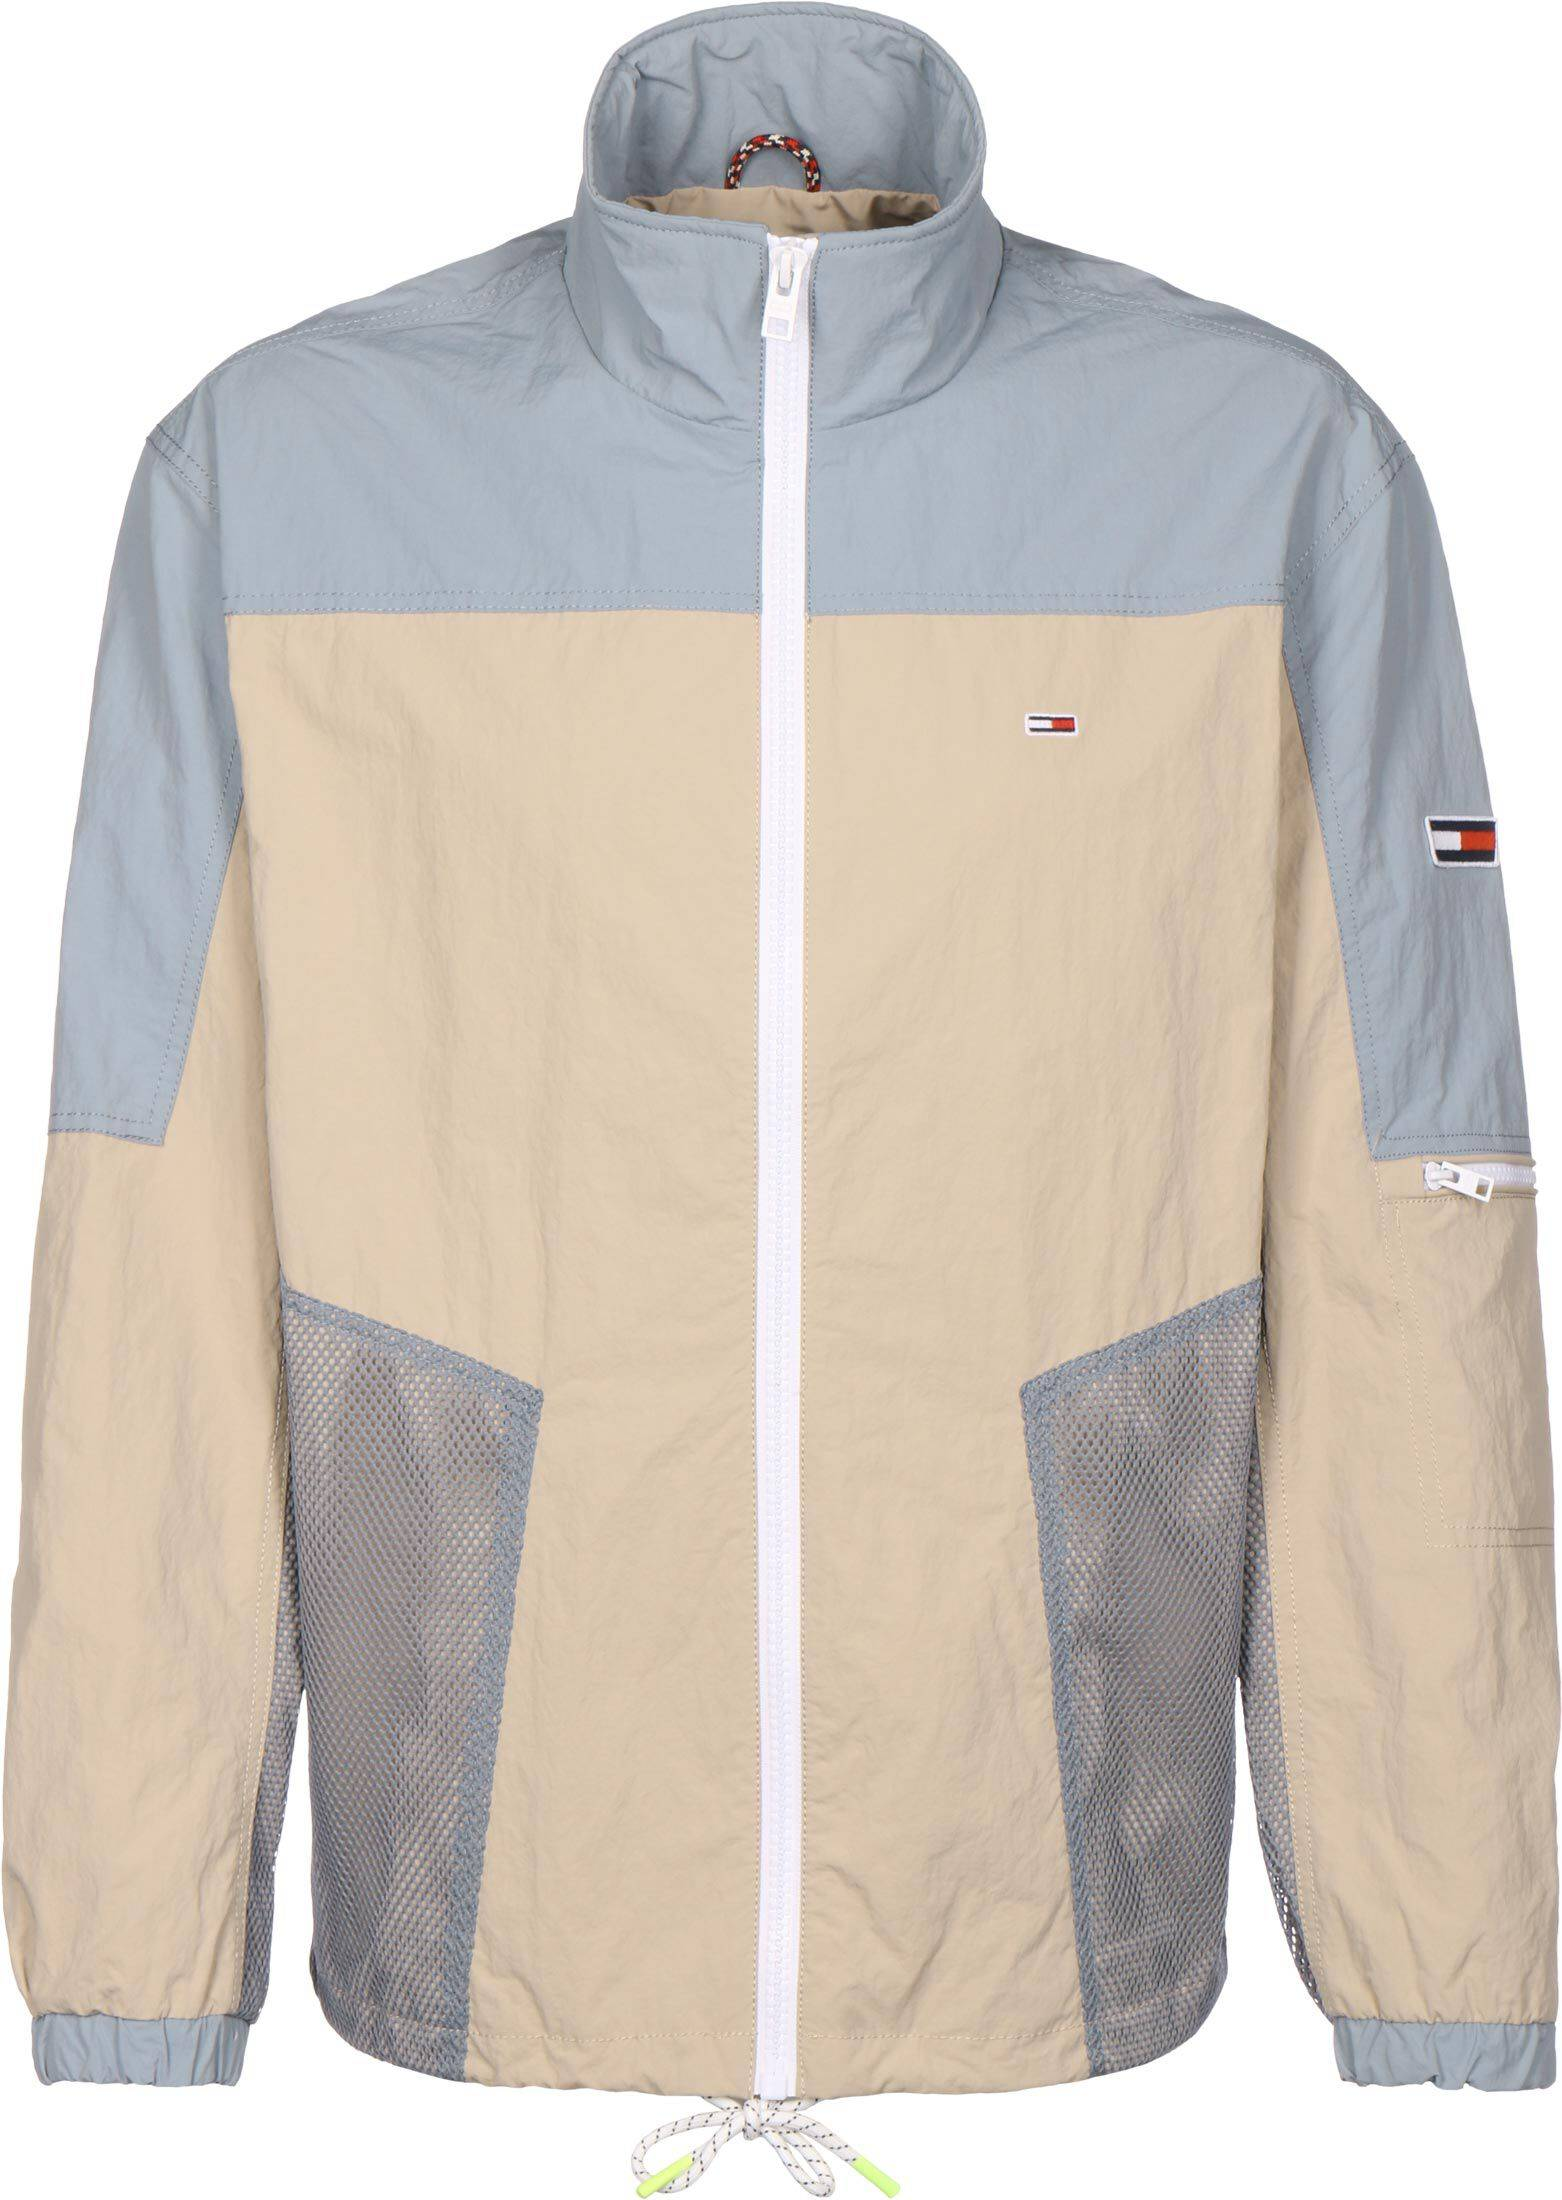 Tommy Jeans Mix Media Colorblock, taille L, homme, beige bleu